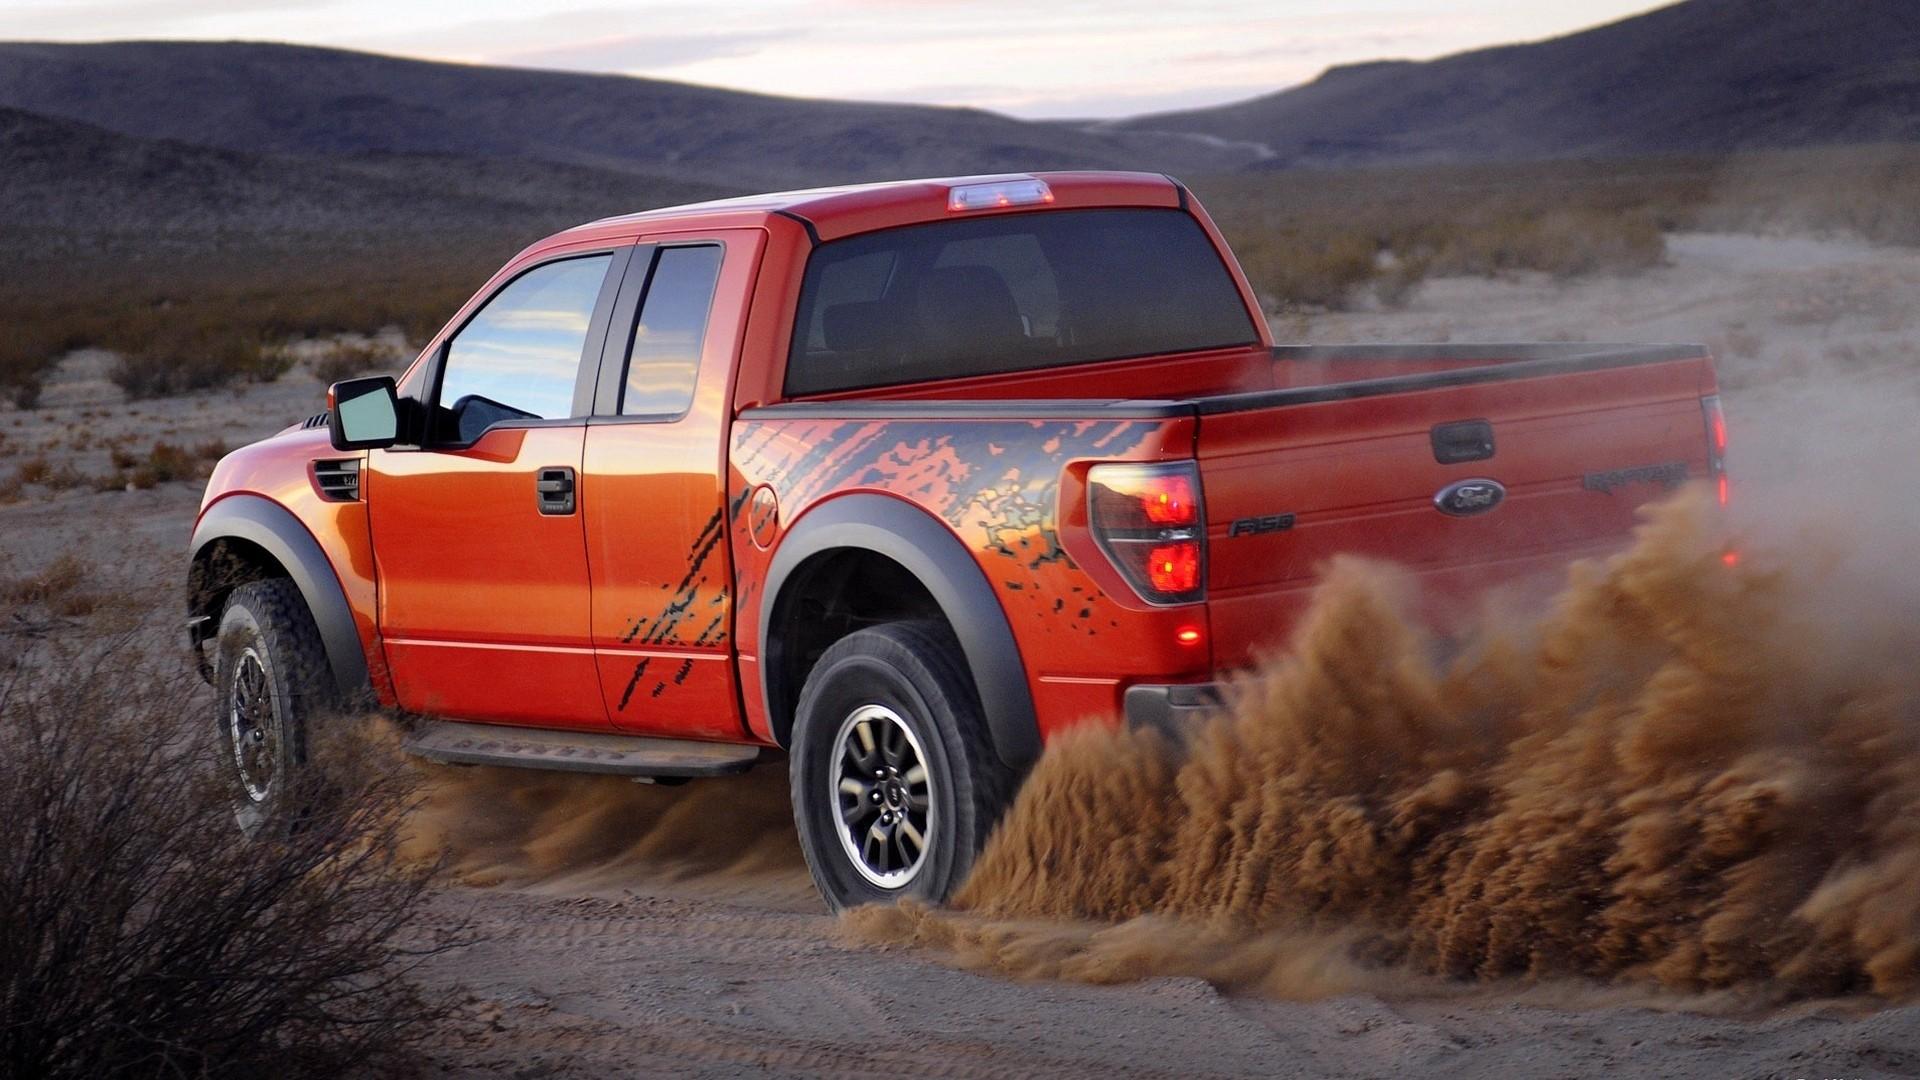 … Cool Truck Wallpapers cool truck wallpapers hd resolution …